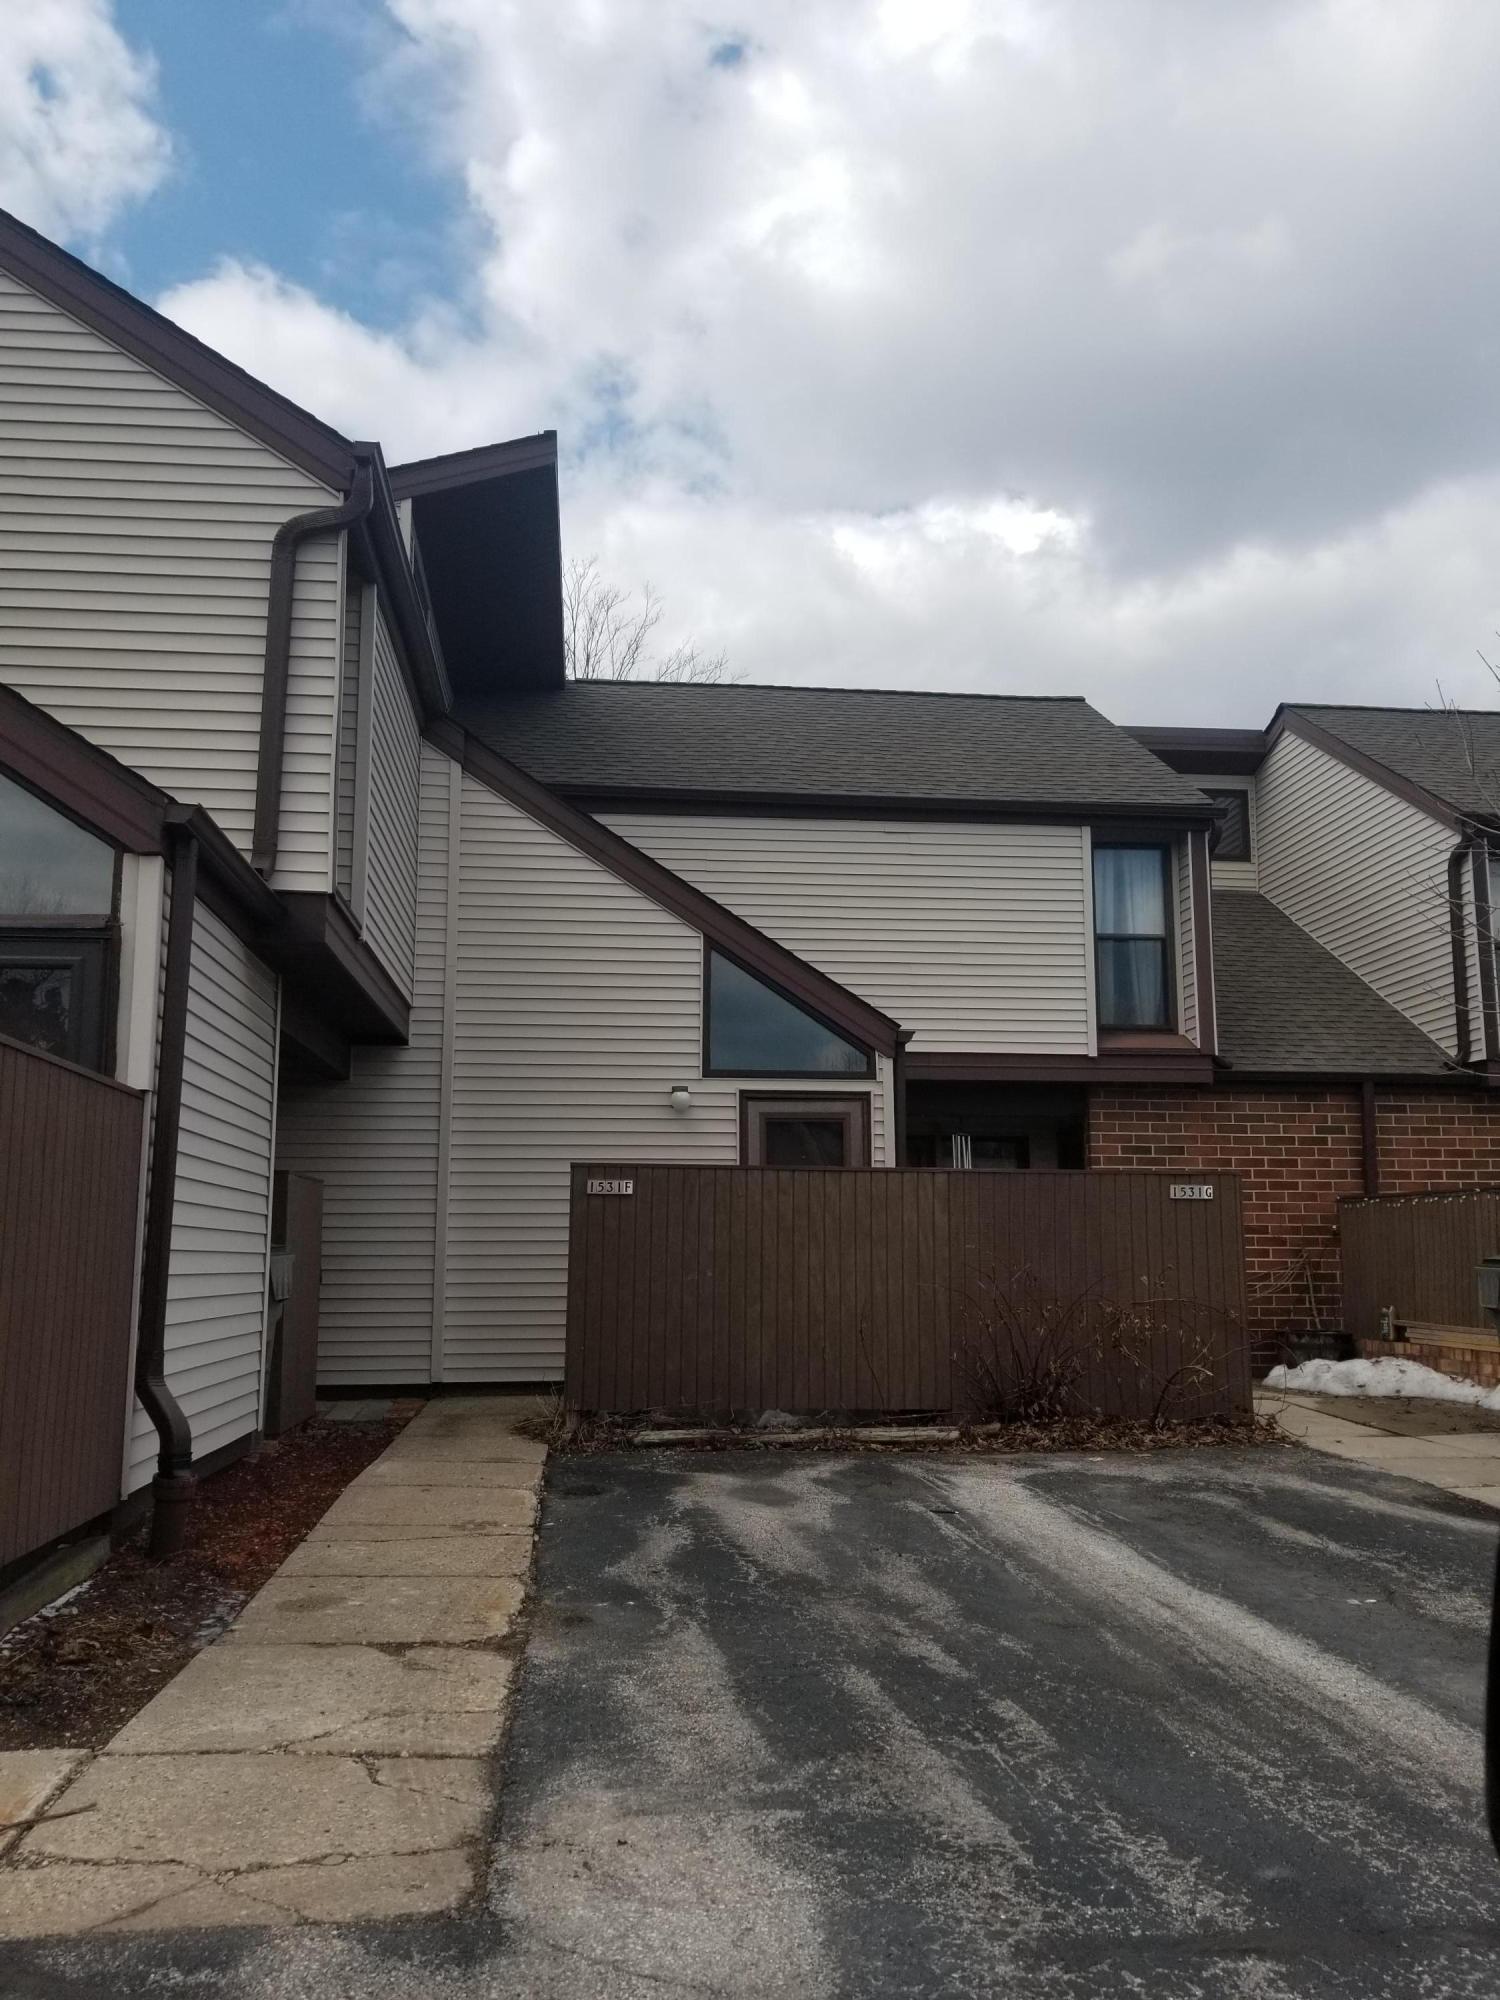 1531 Edgerton Ave, Milwaukee, Wisconsin 53221, 3 Bedrooms Bedrooms, ,1 BathroomBathrooms,Condominiums,For Sale,Edgerton Ave,1,1627062